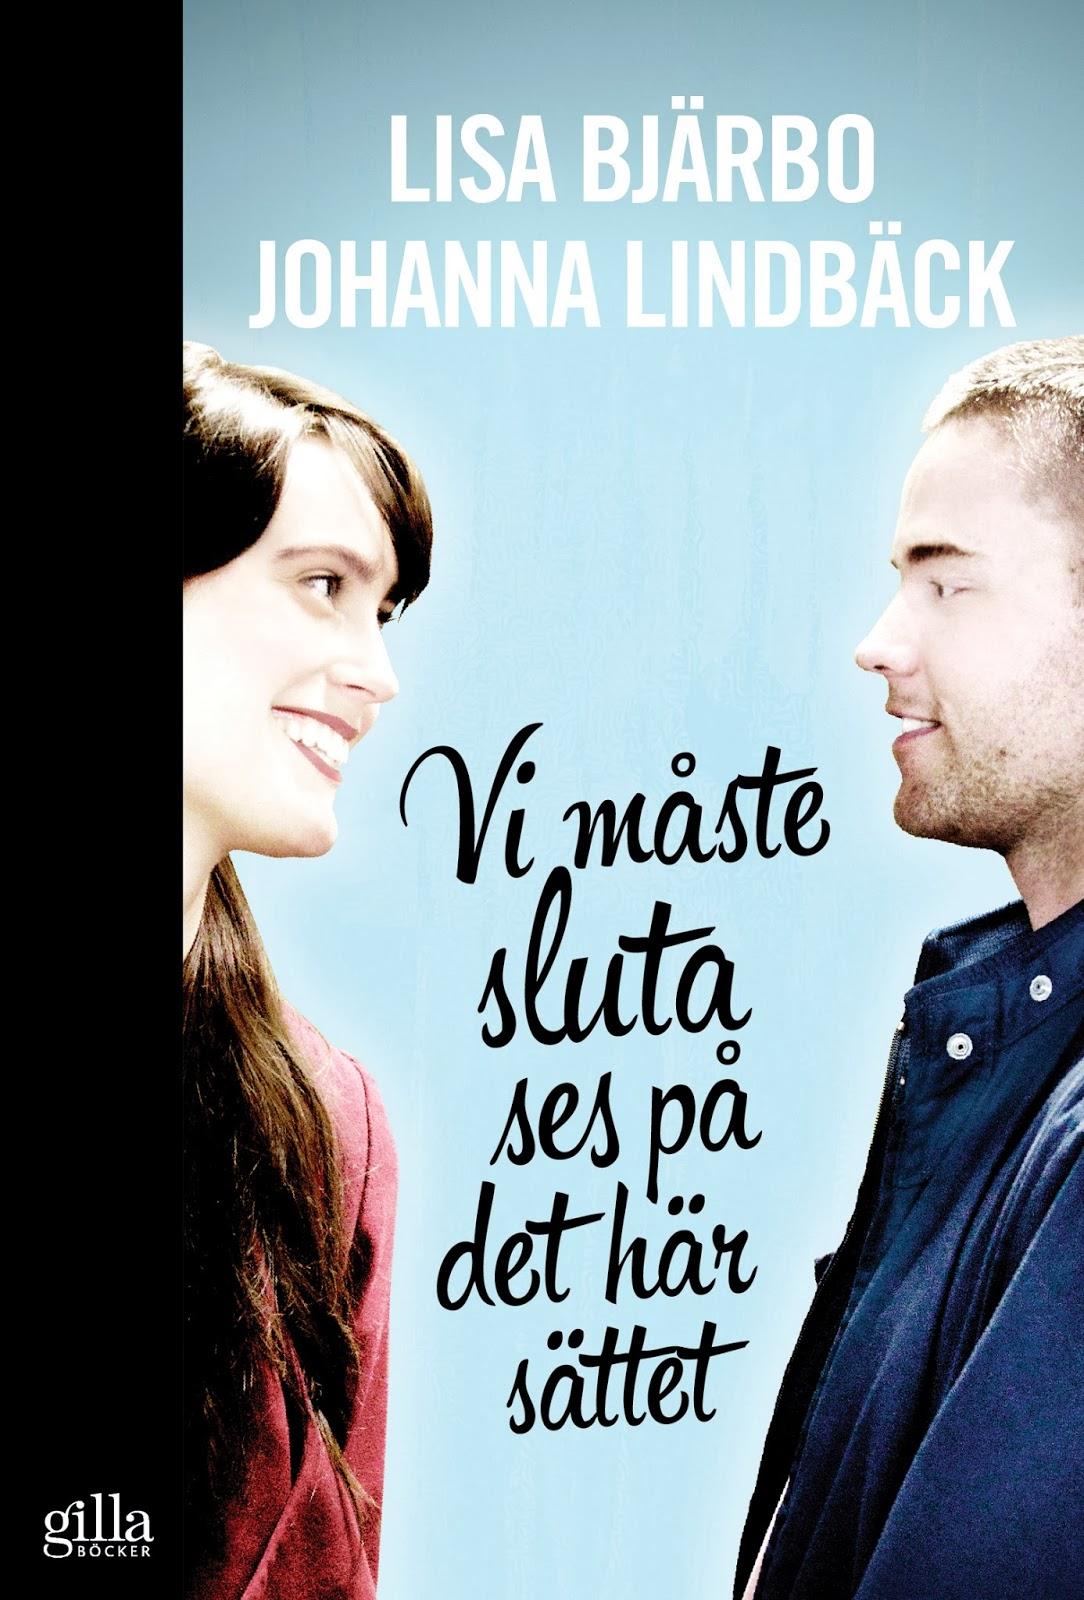 http://juliasnerdroom.blogspot.se/2013/10/vi-maste-sluta-ses-pa-det-har-sattet.html#comment-form